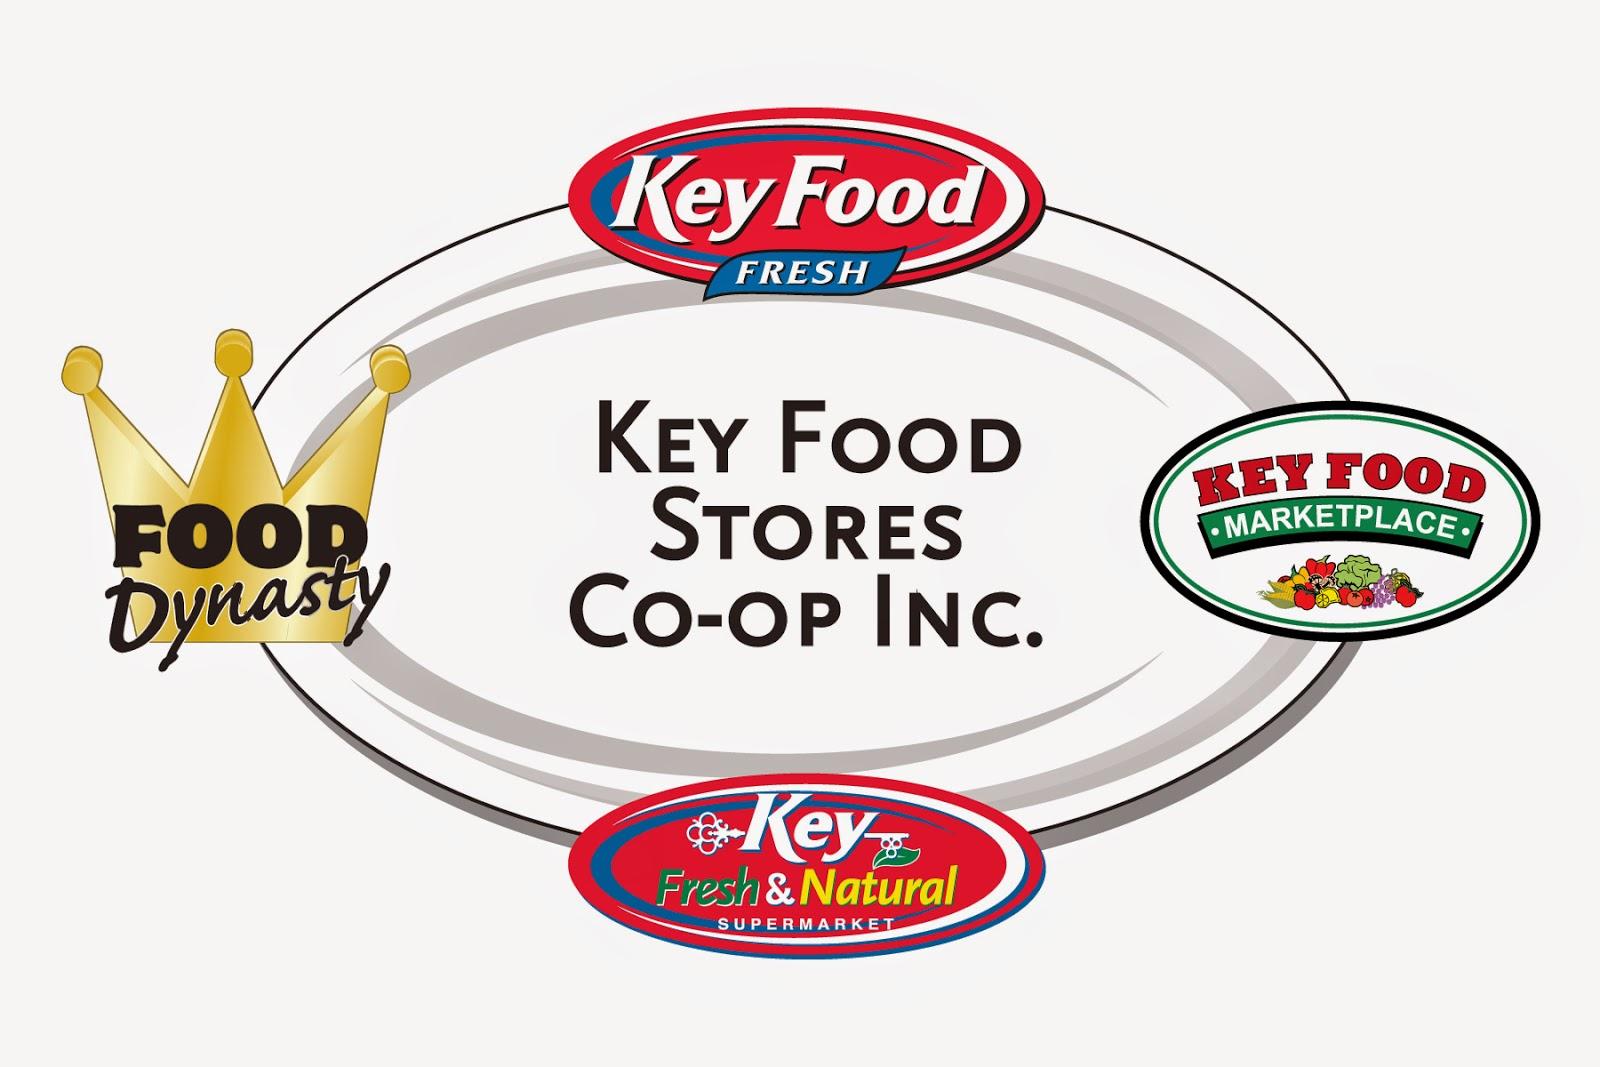 Key York Circular New Food